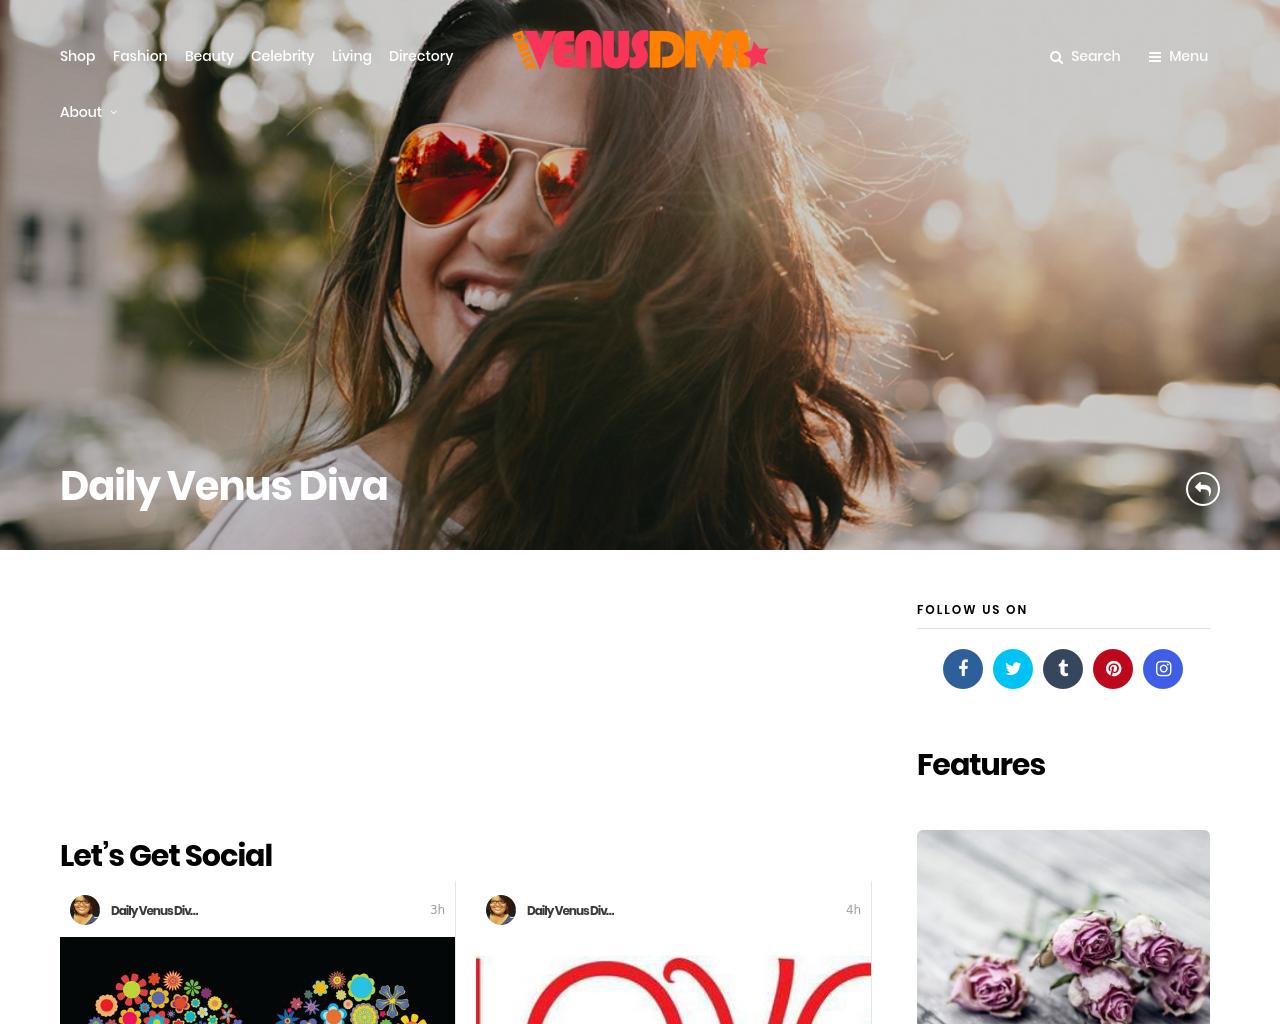 Daily-Venus-Diva-Advertising-Reviews-Pricing